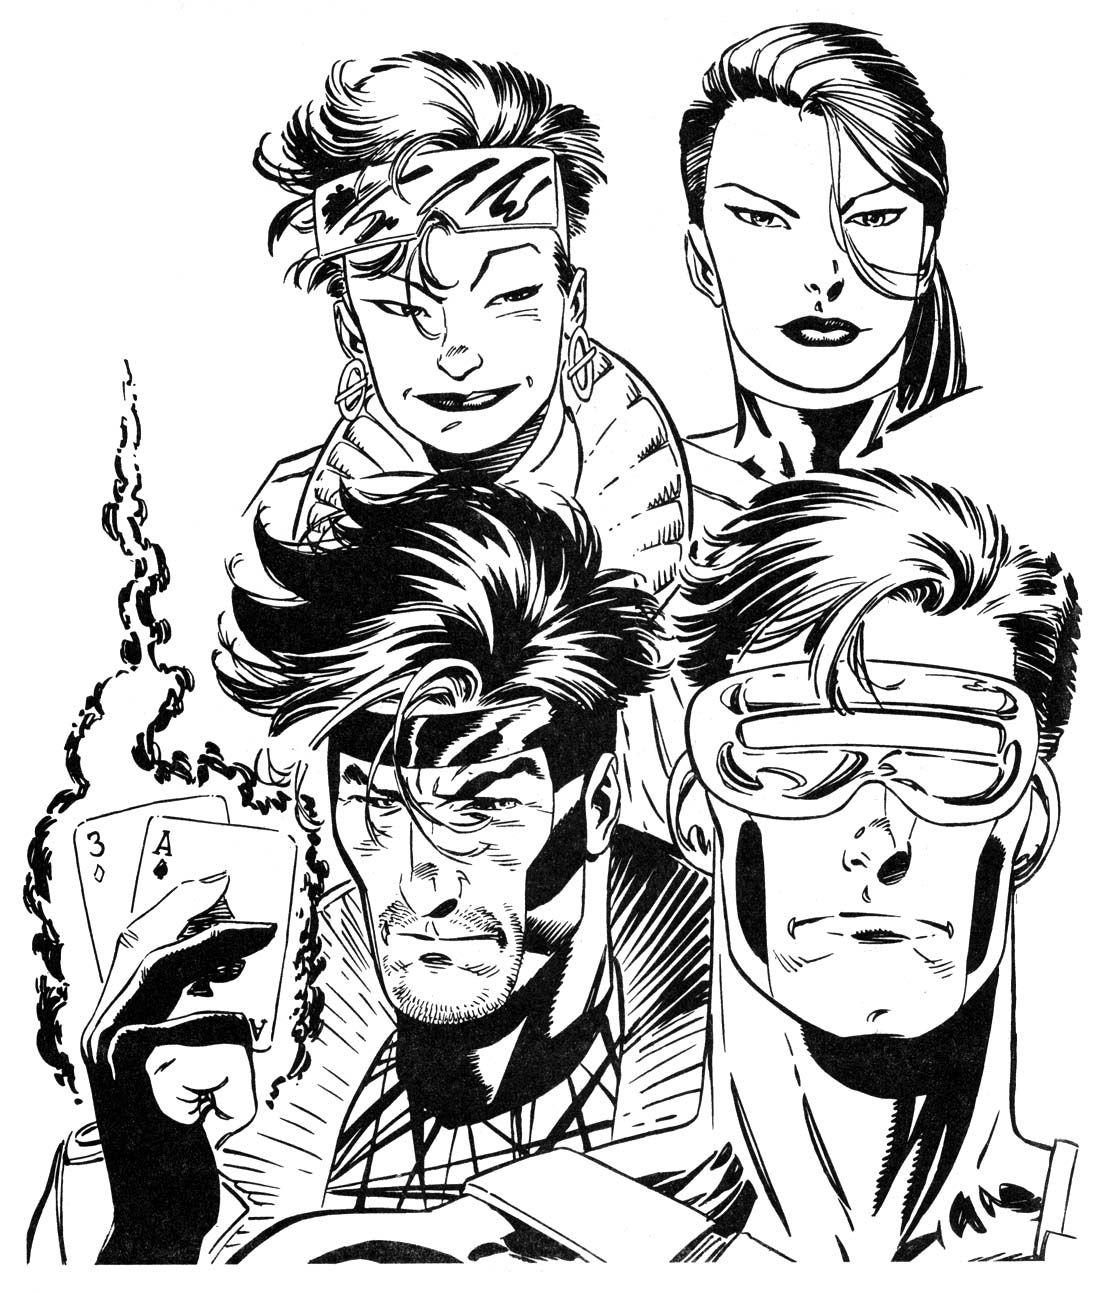 Coloring Marvel Superhero : Best marvel superhero coloring pages